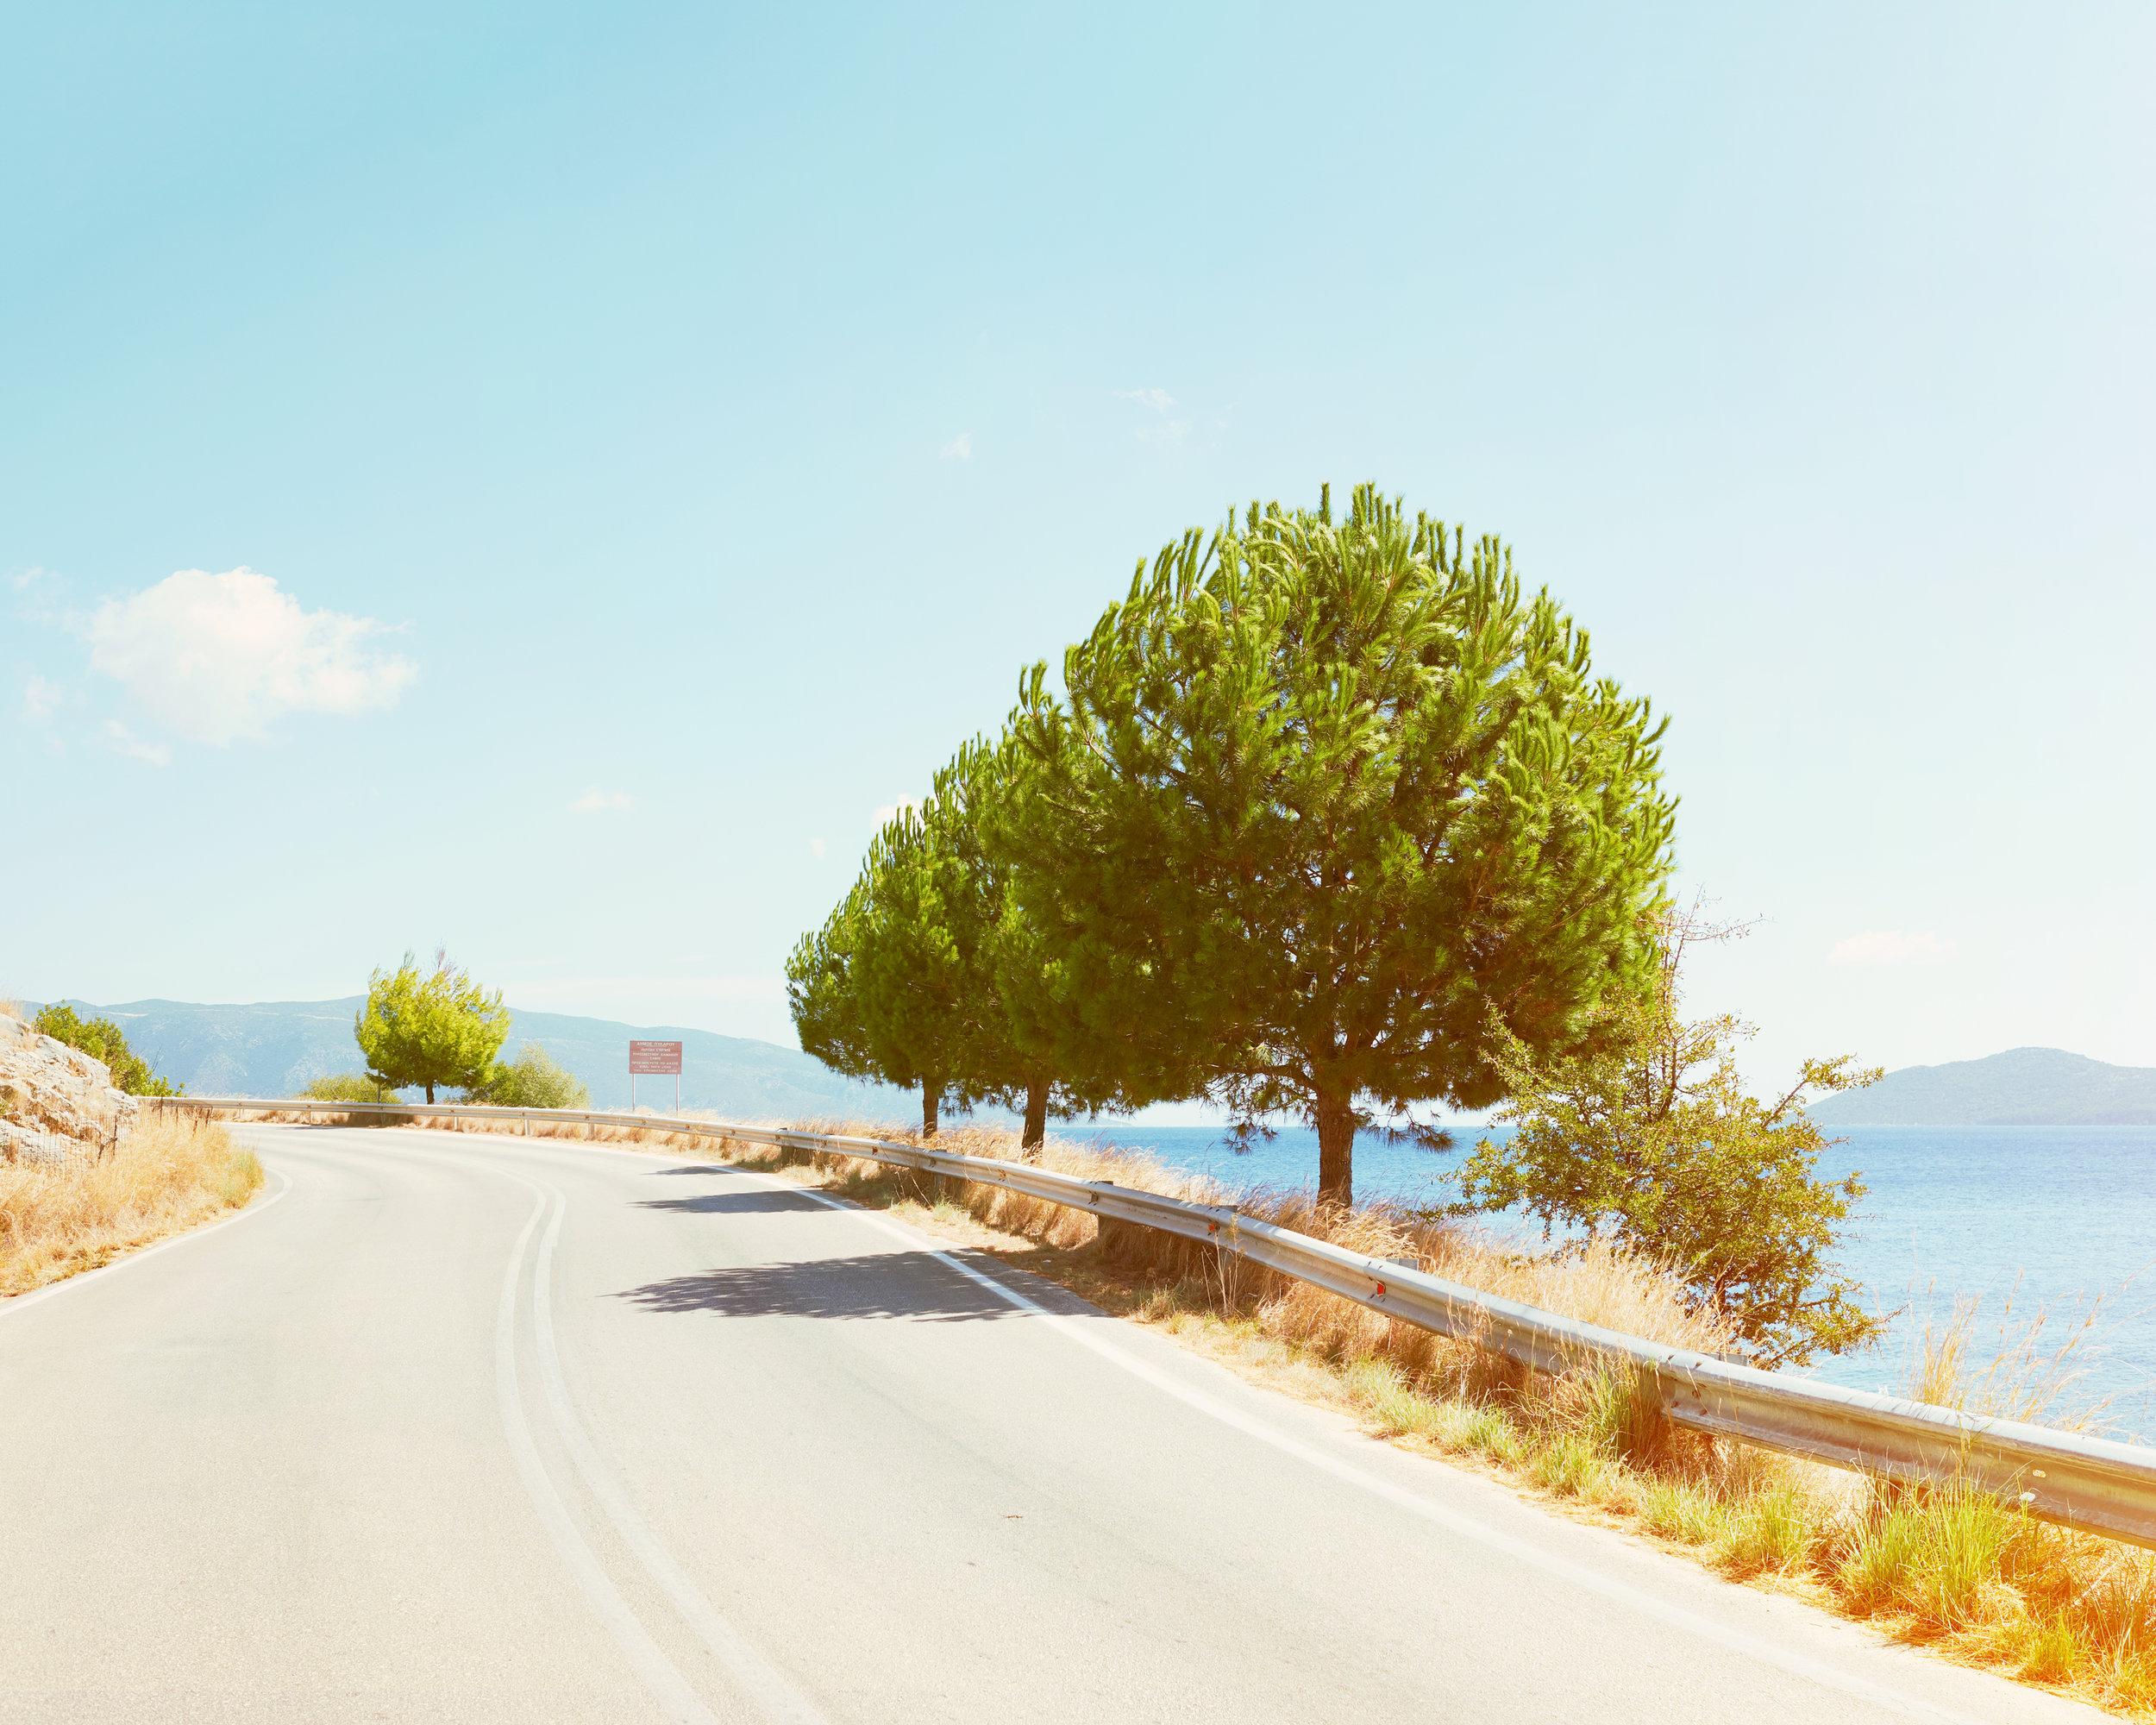 Roadside no. 3.jpg